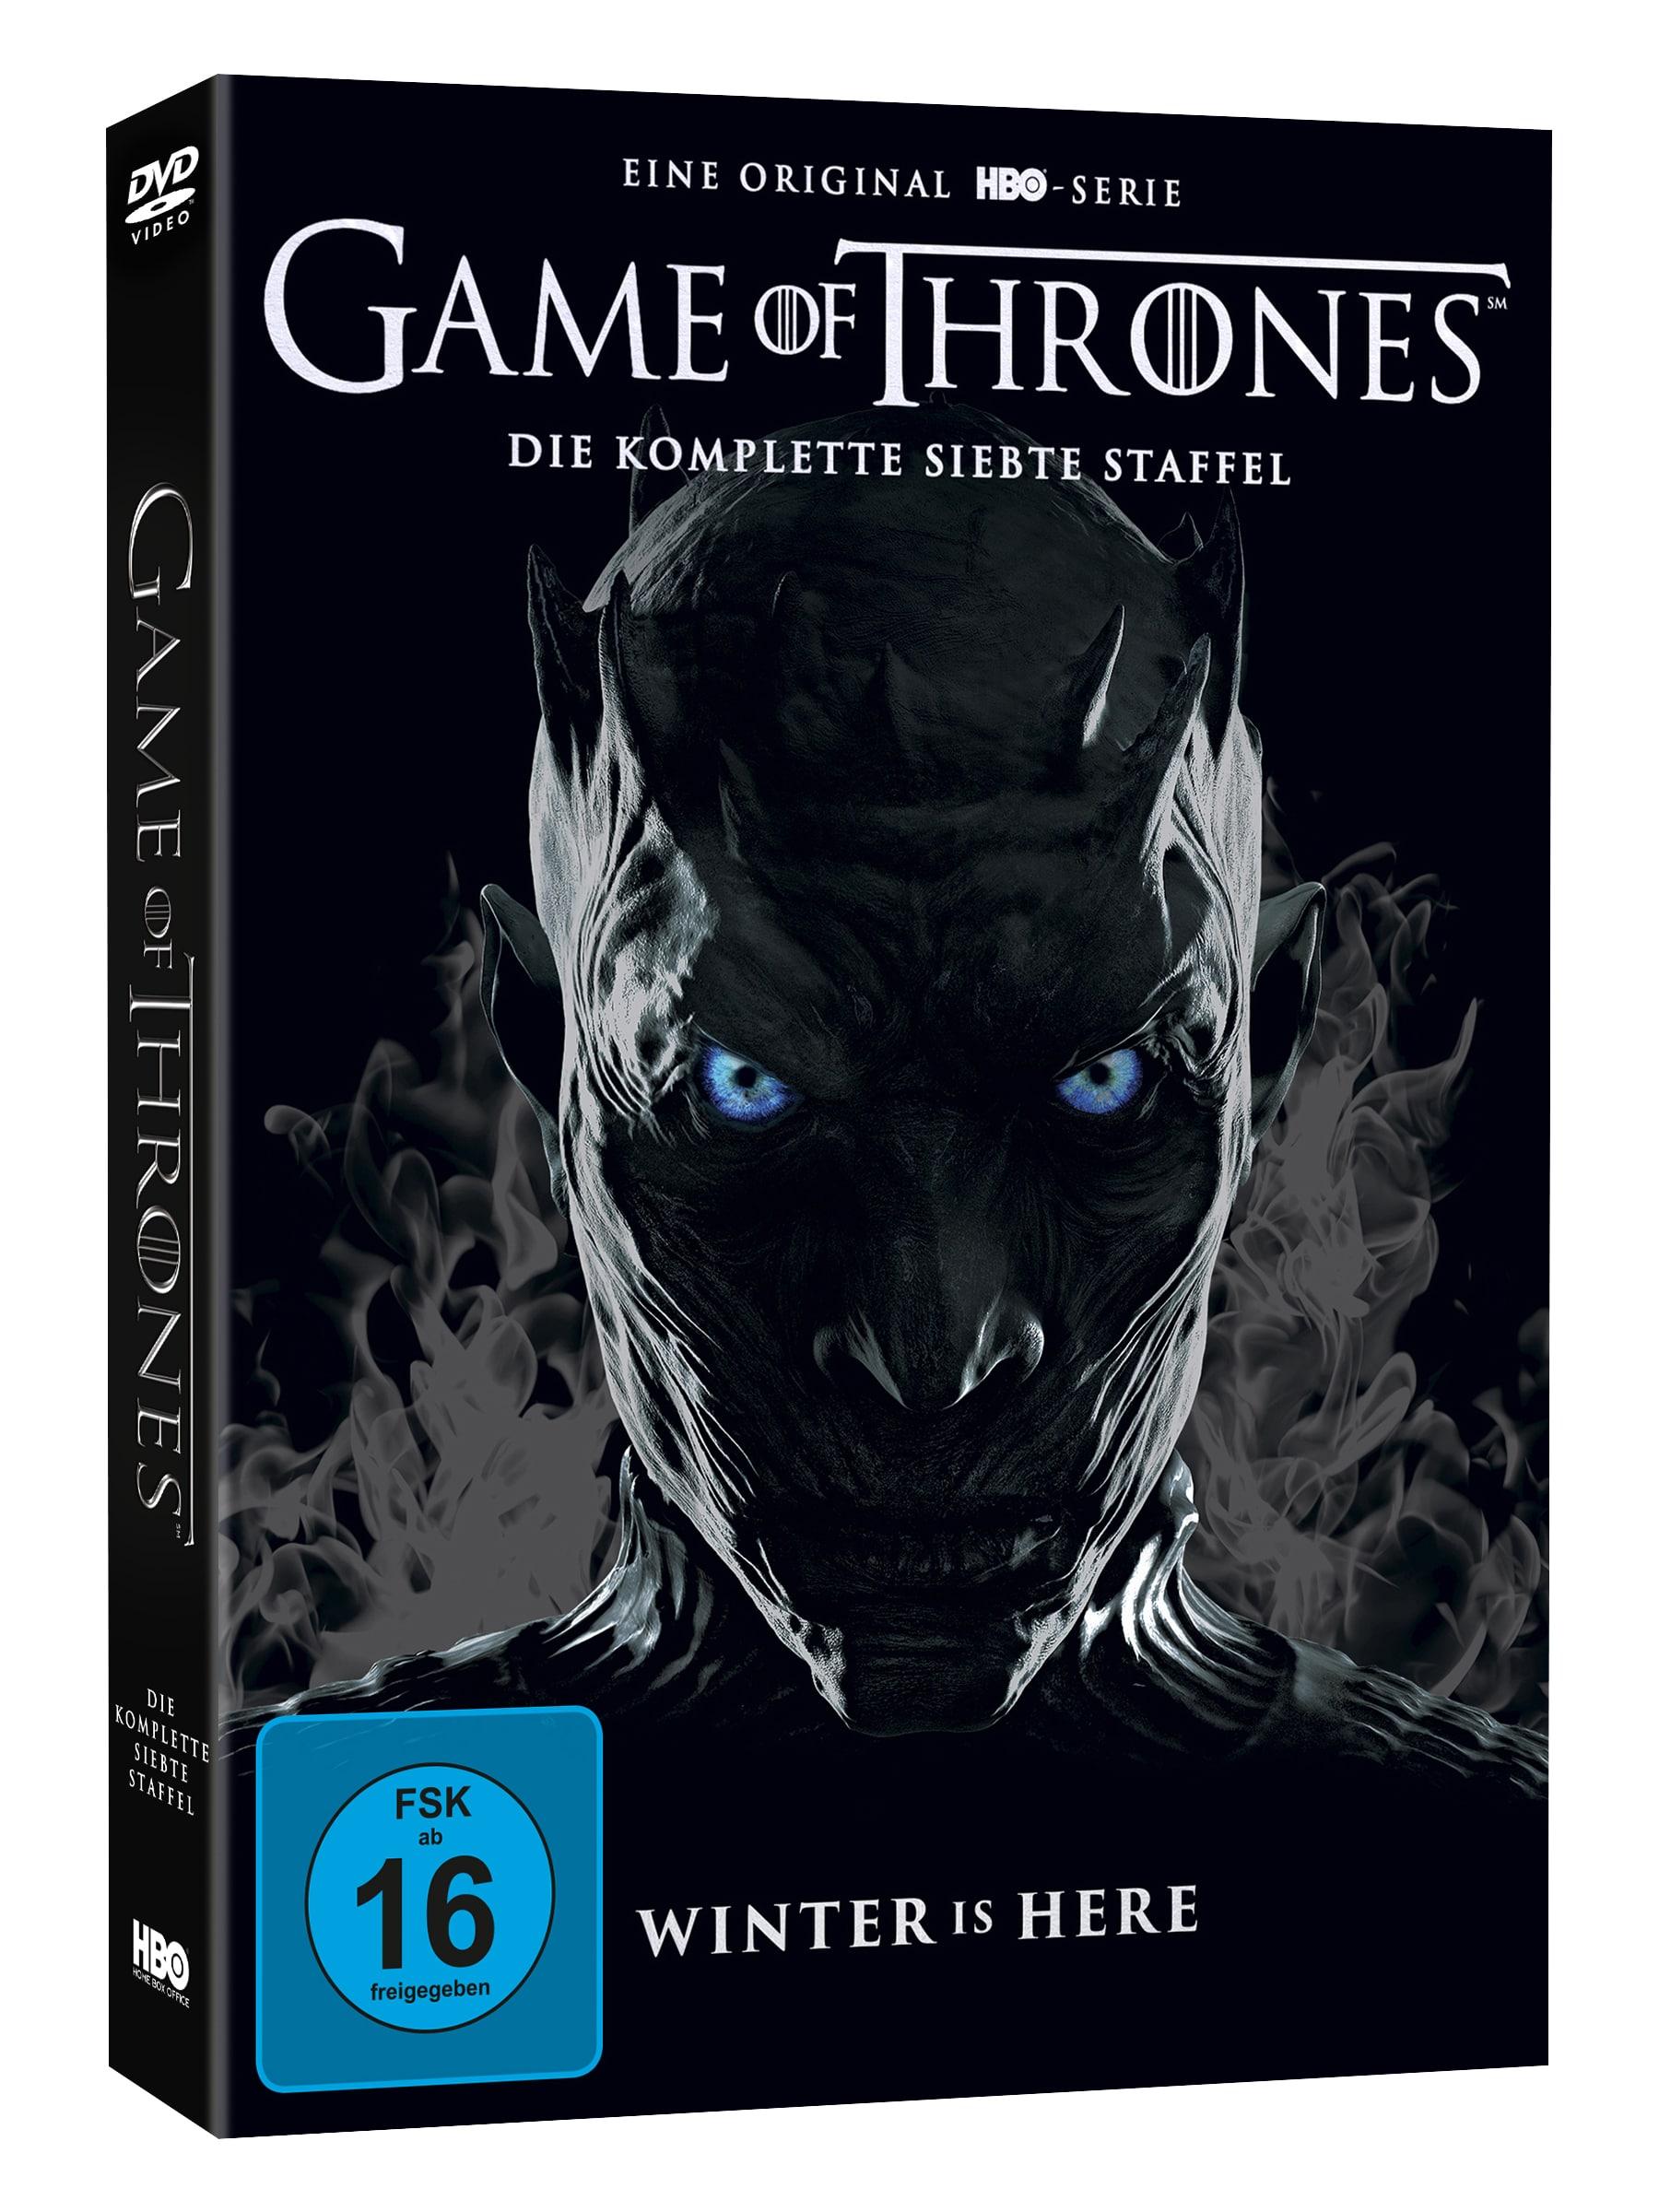 Game of Thrones - Die komplette siebte Staffel, Rechte bei Warner Home Video